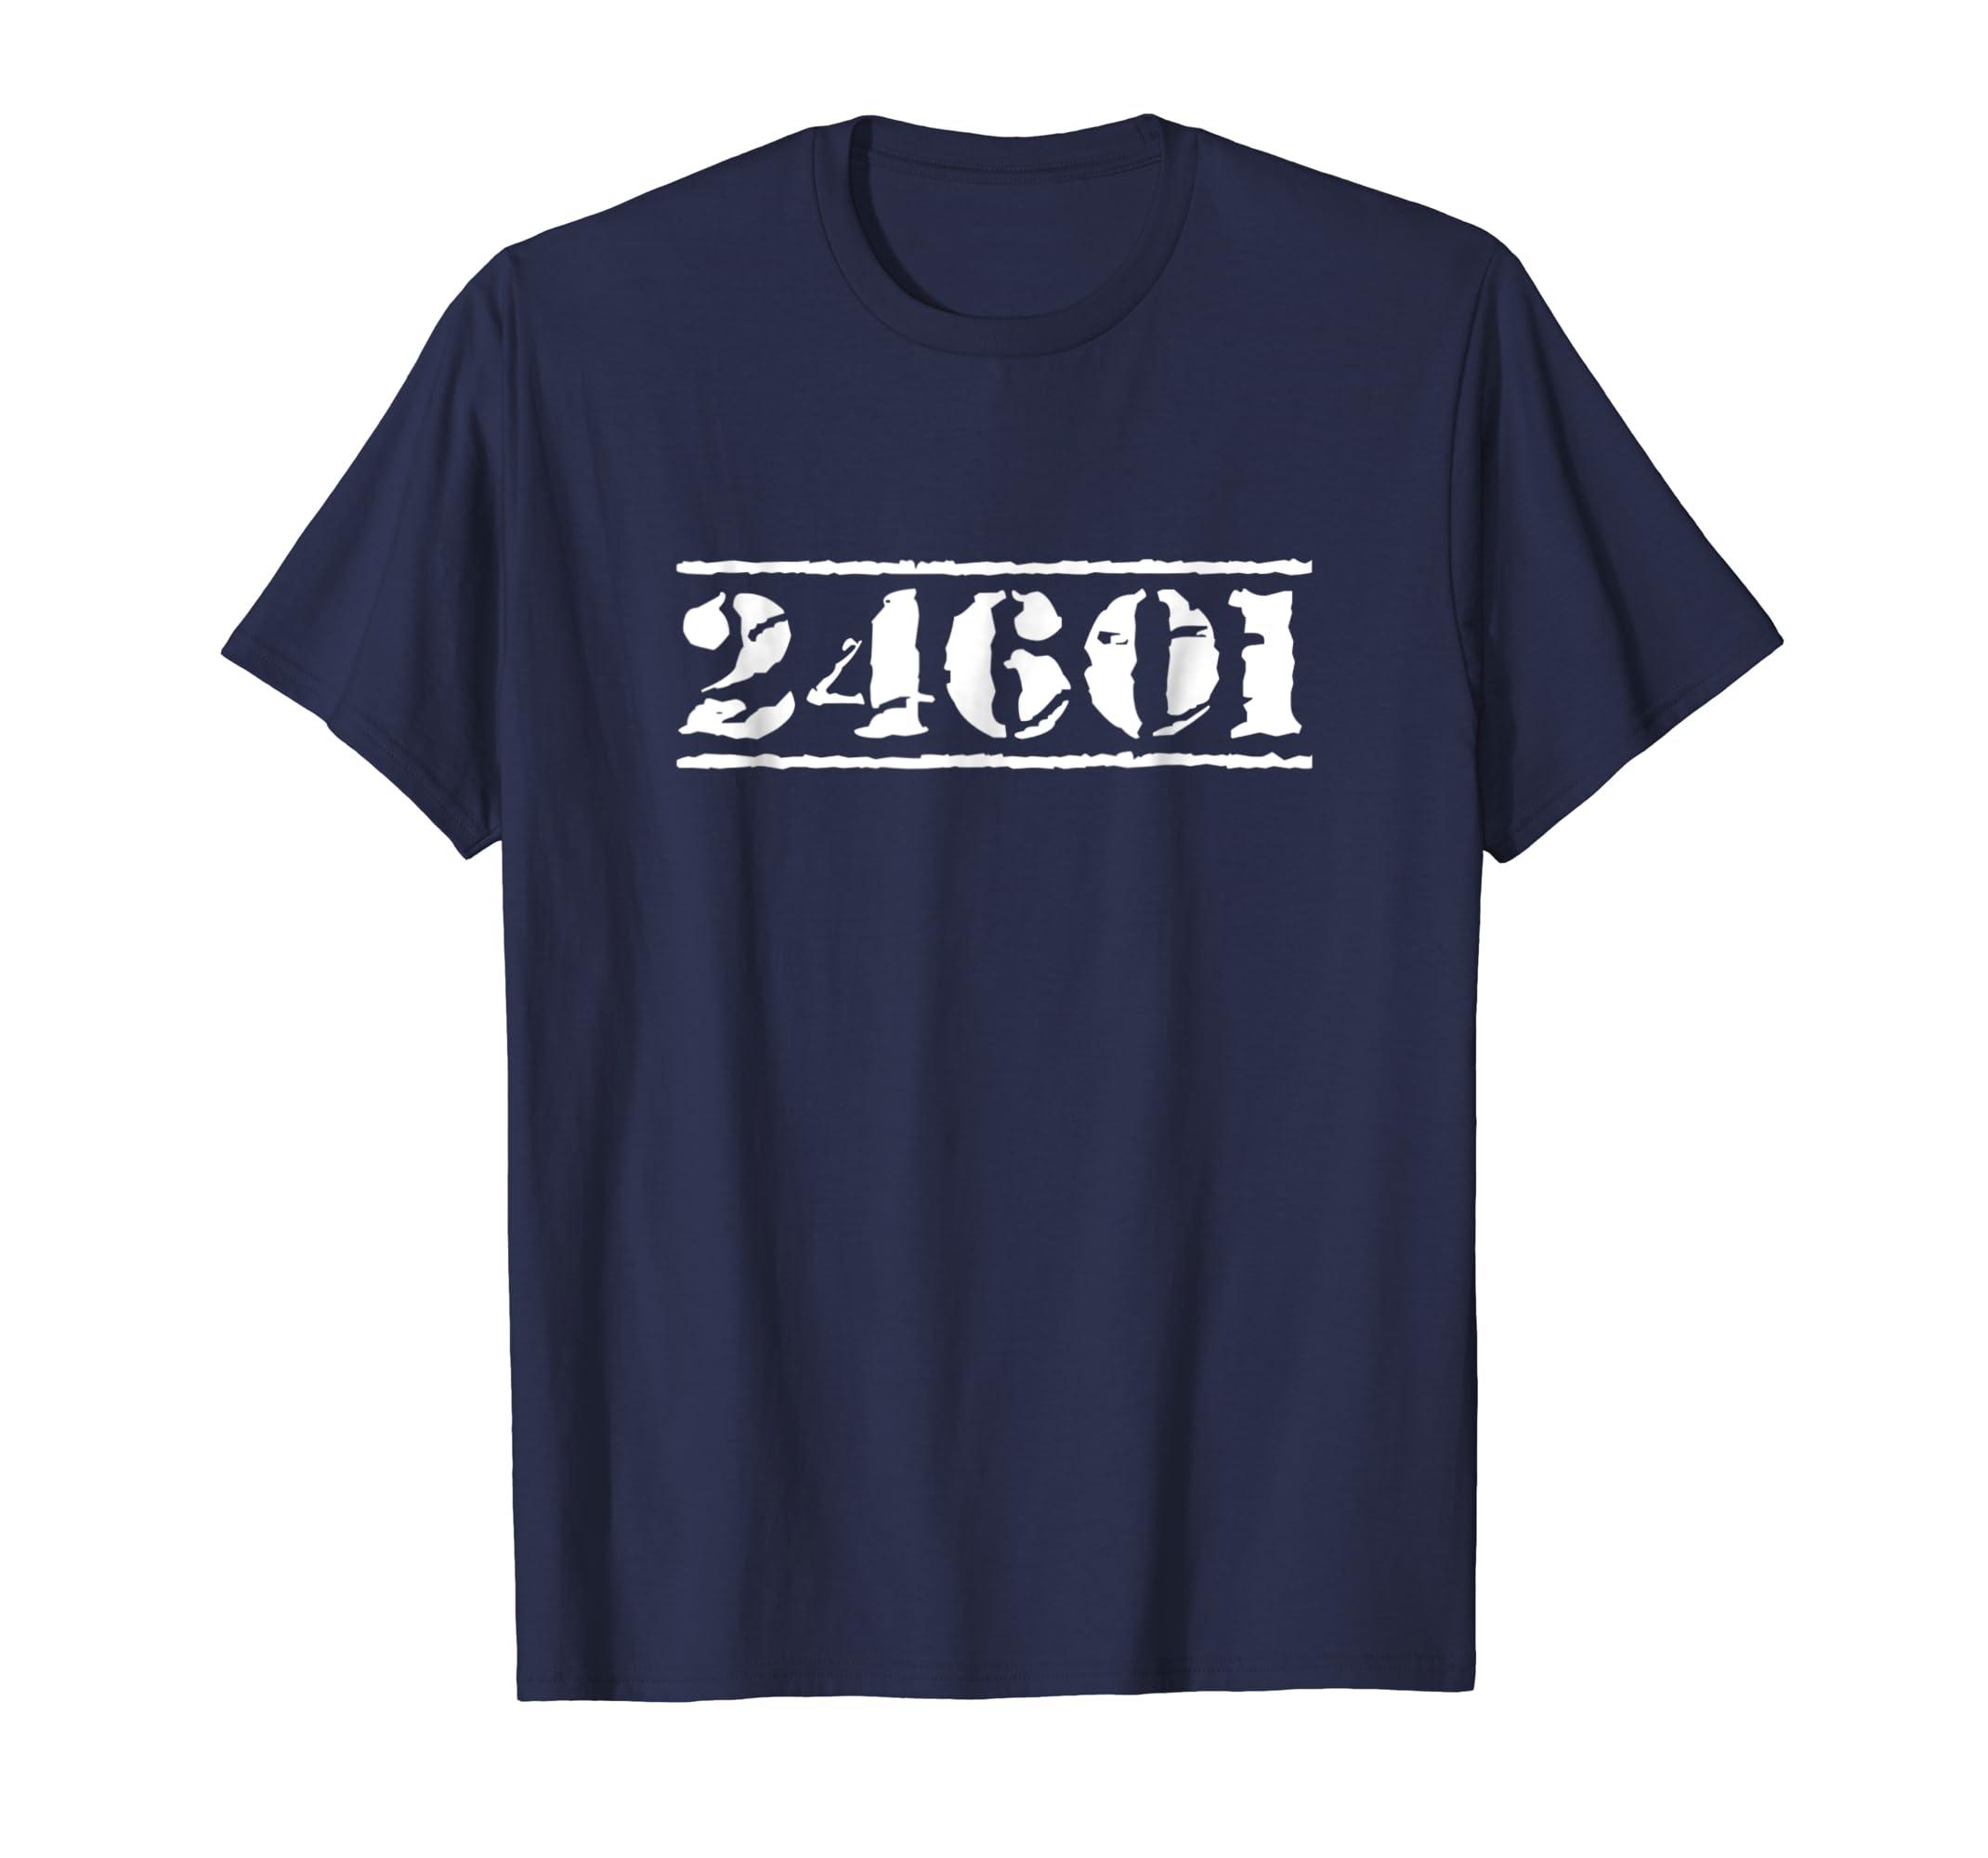 24601 Tee-azvn